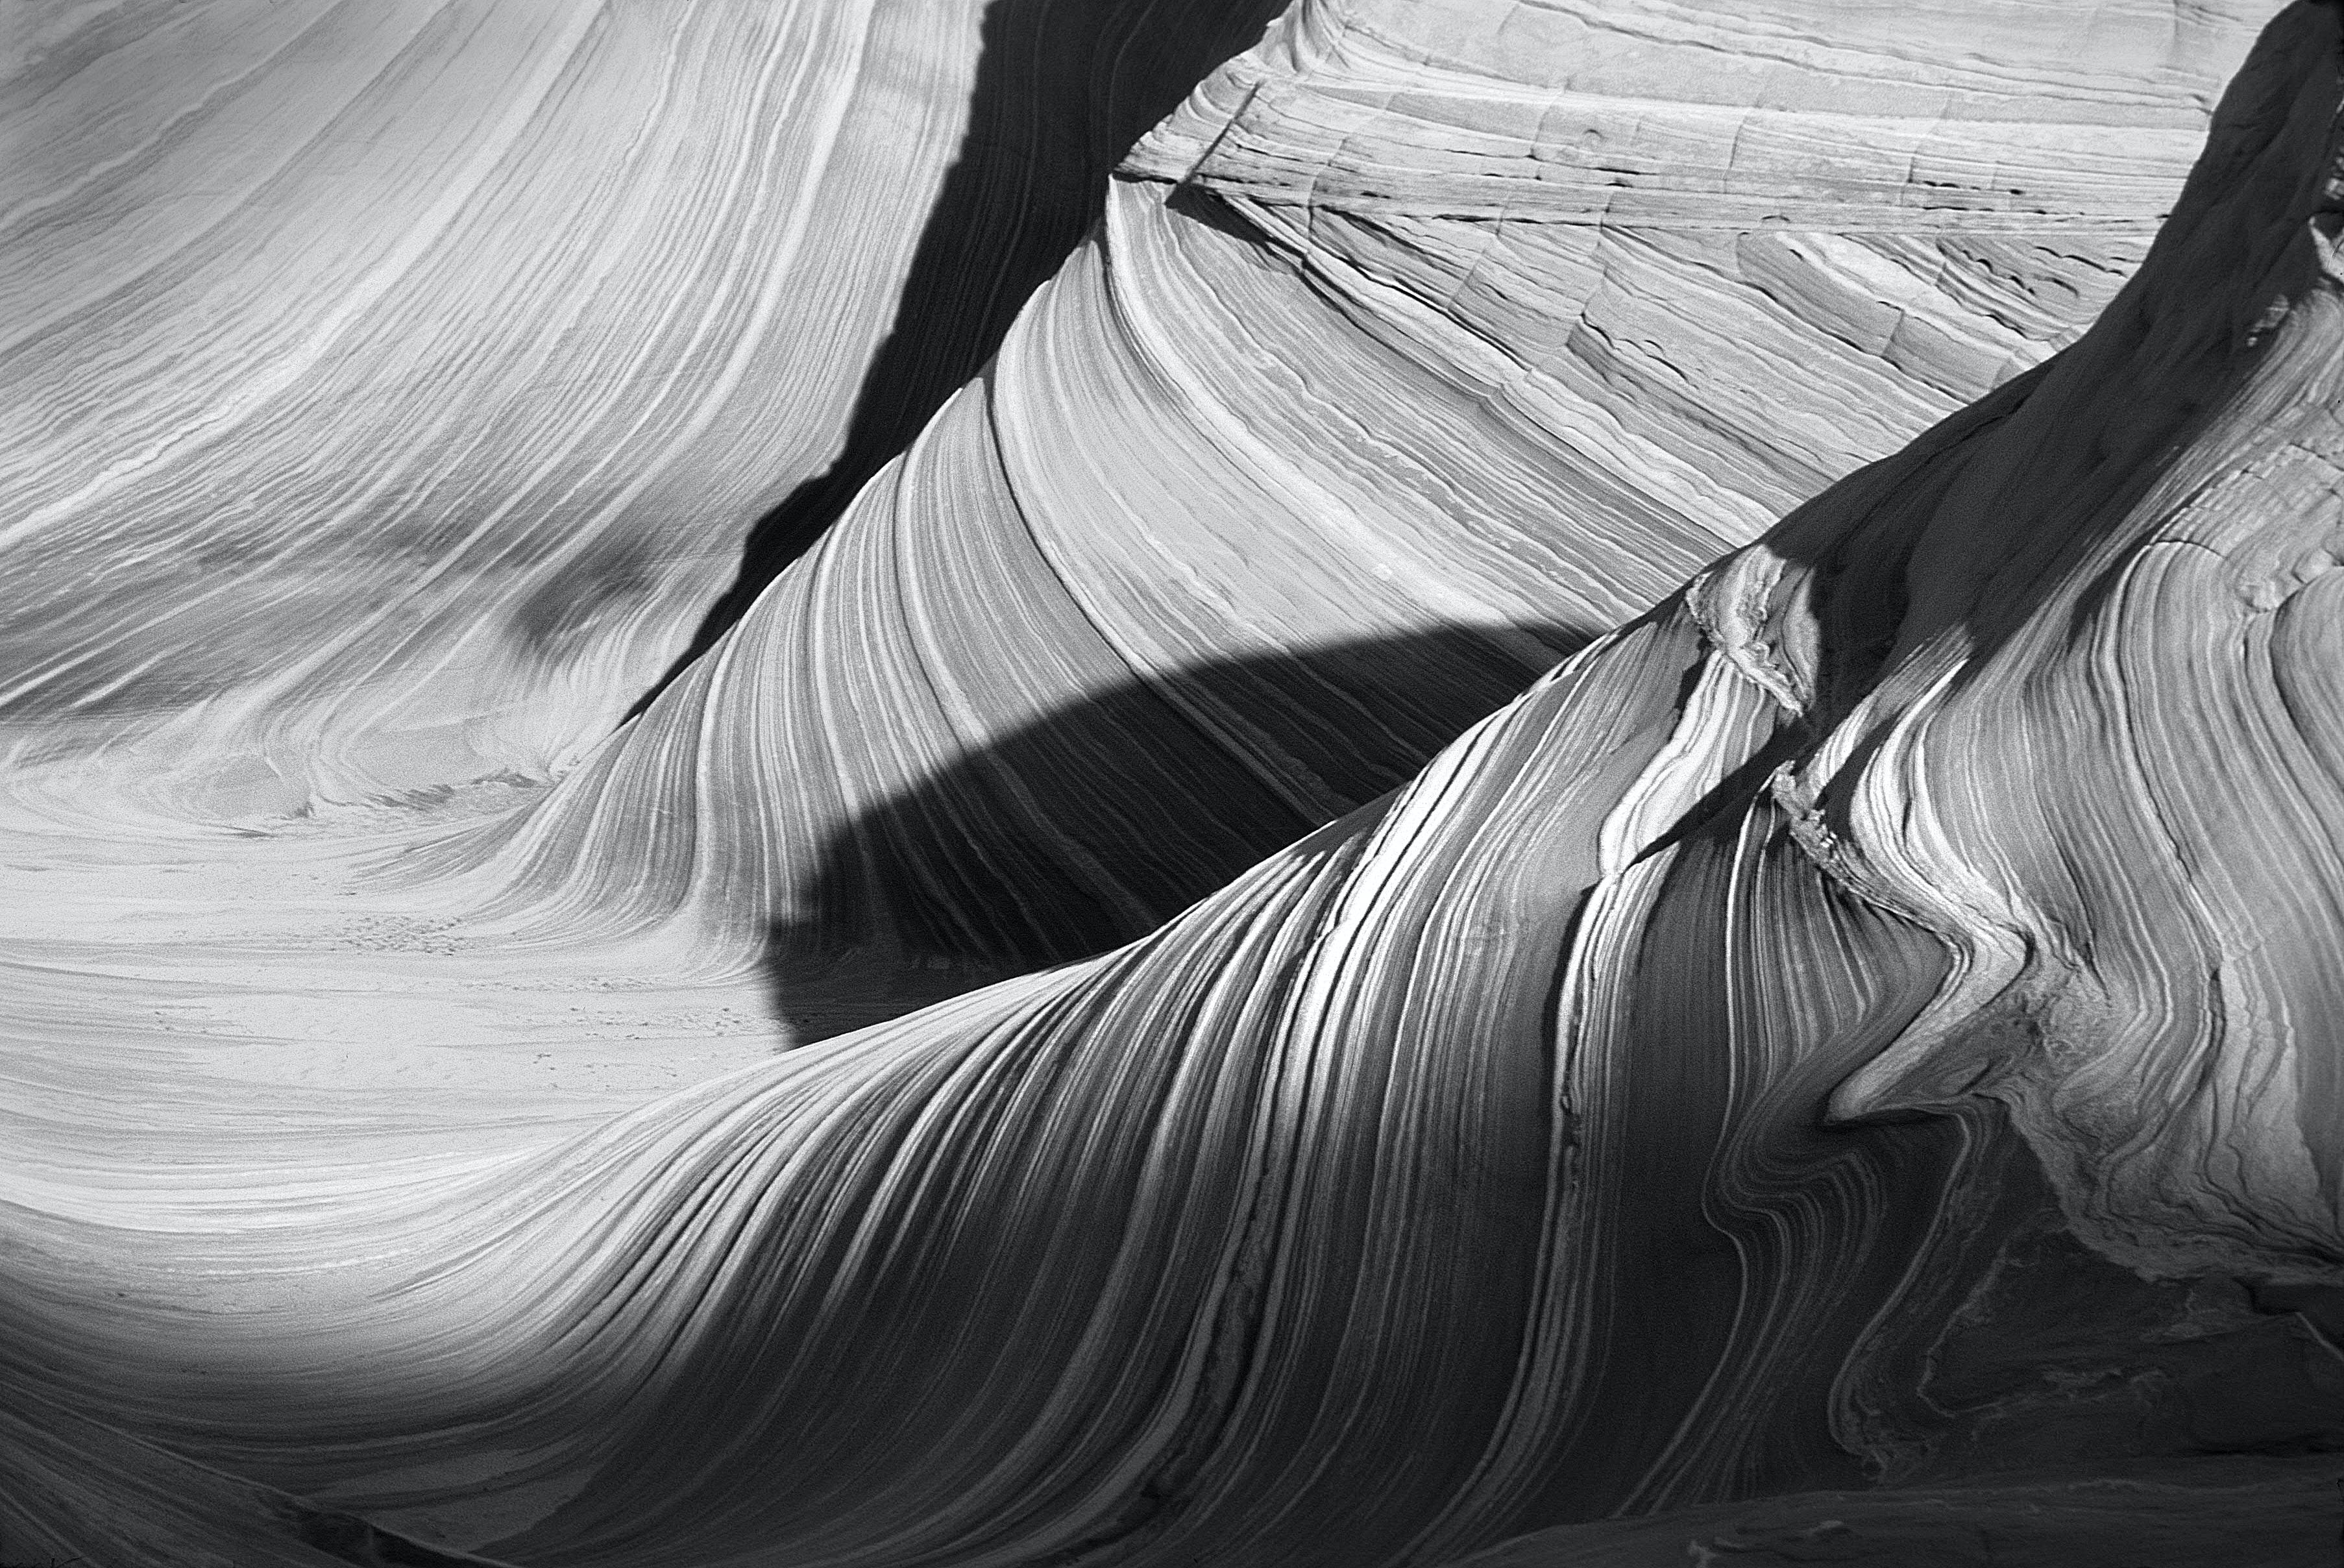 Kostenloses Stock Foto zu canyon, kurve, landschaft, muster